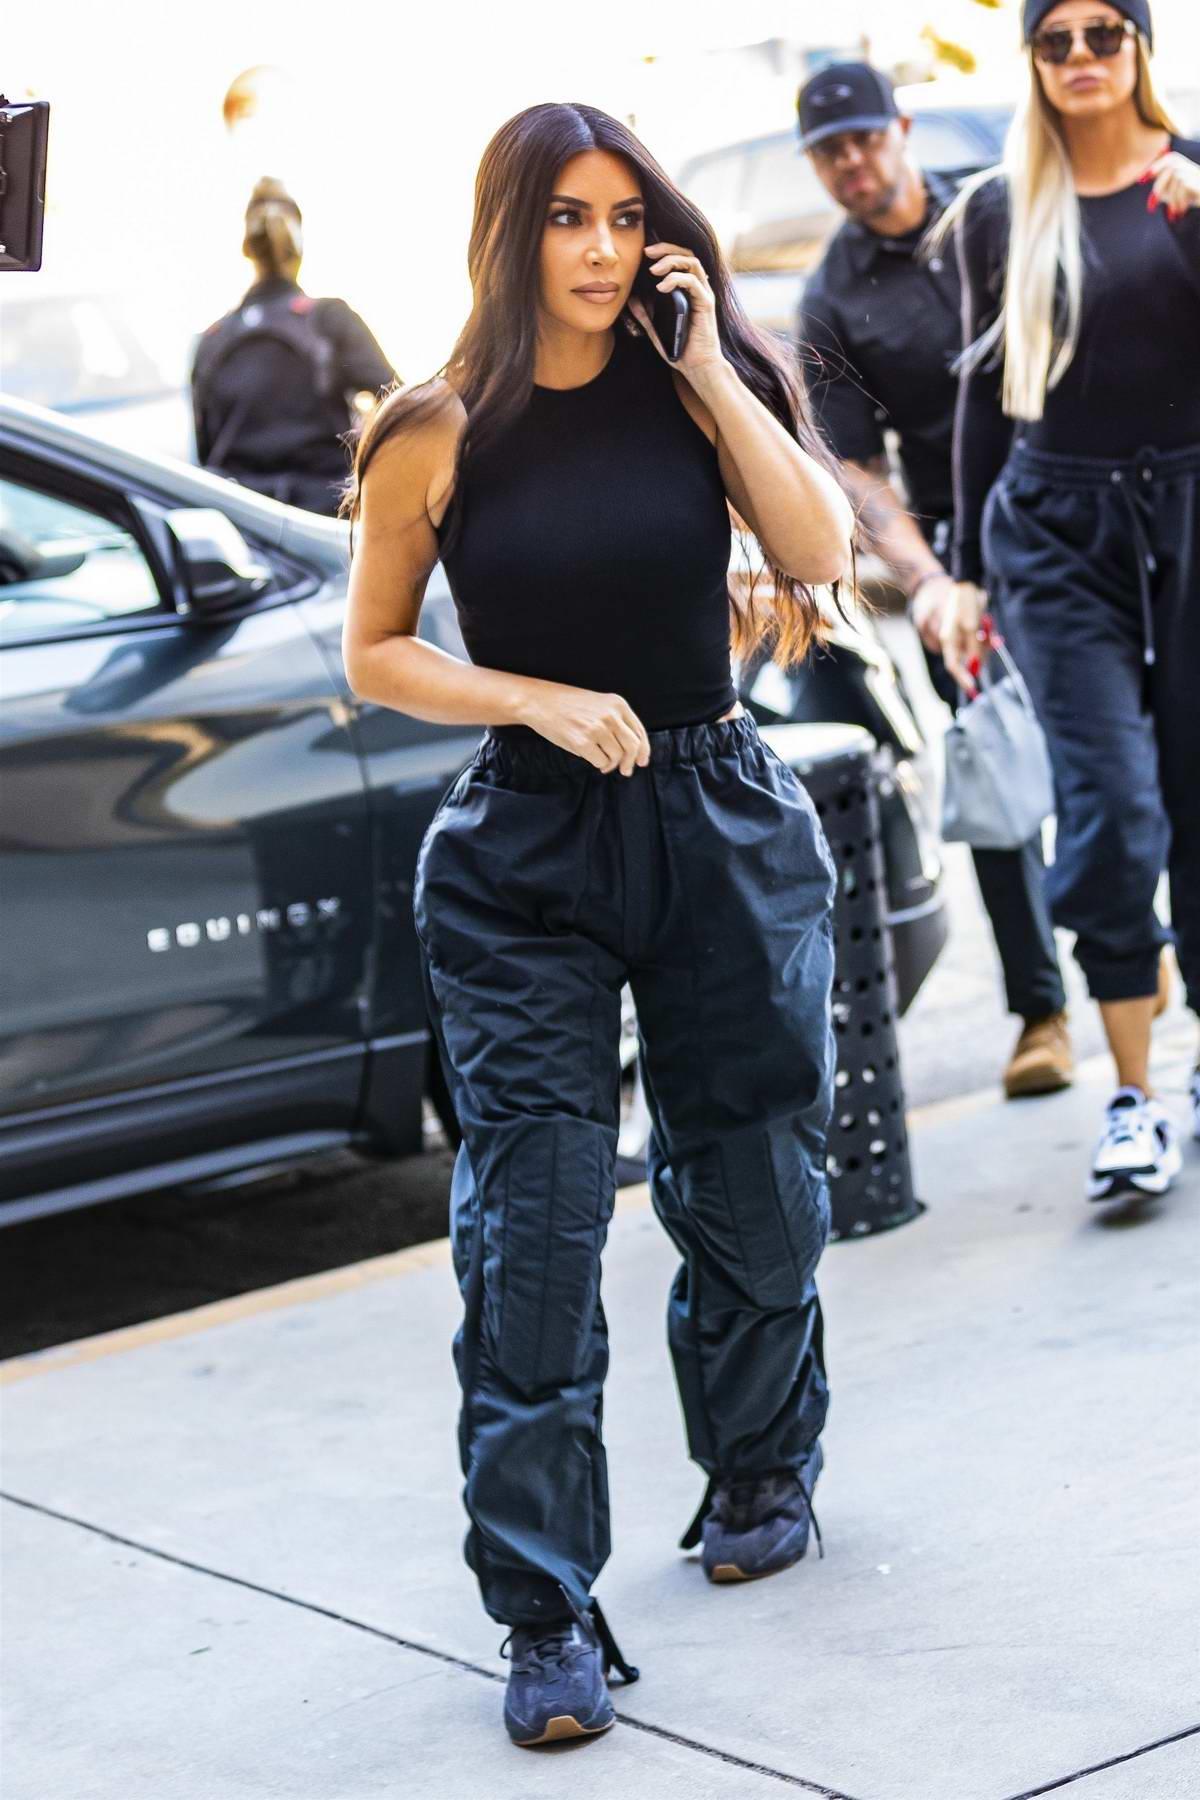 Kim Kardashian and Khloe Kardashian wear matching black attire as they visit Cryohealthcare Medical Center in Los Angeles